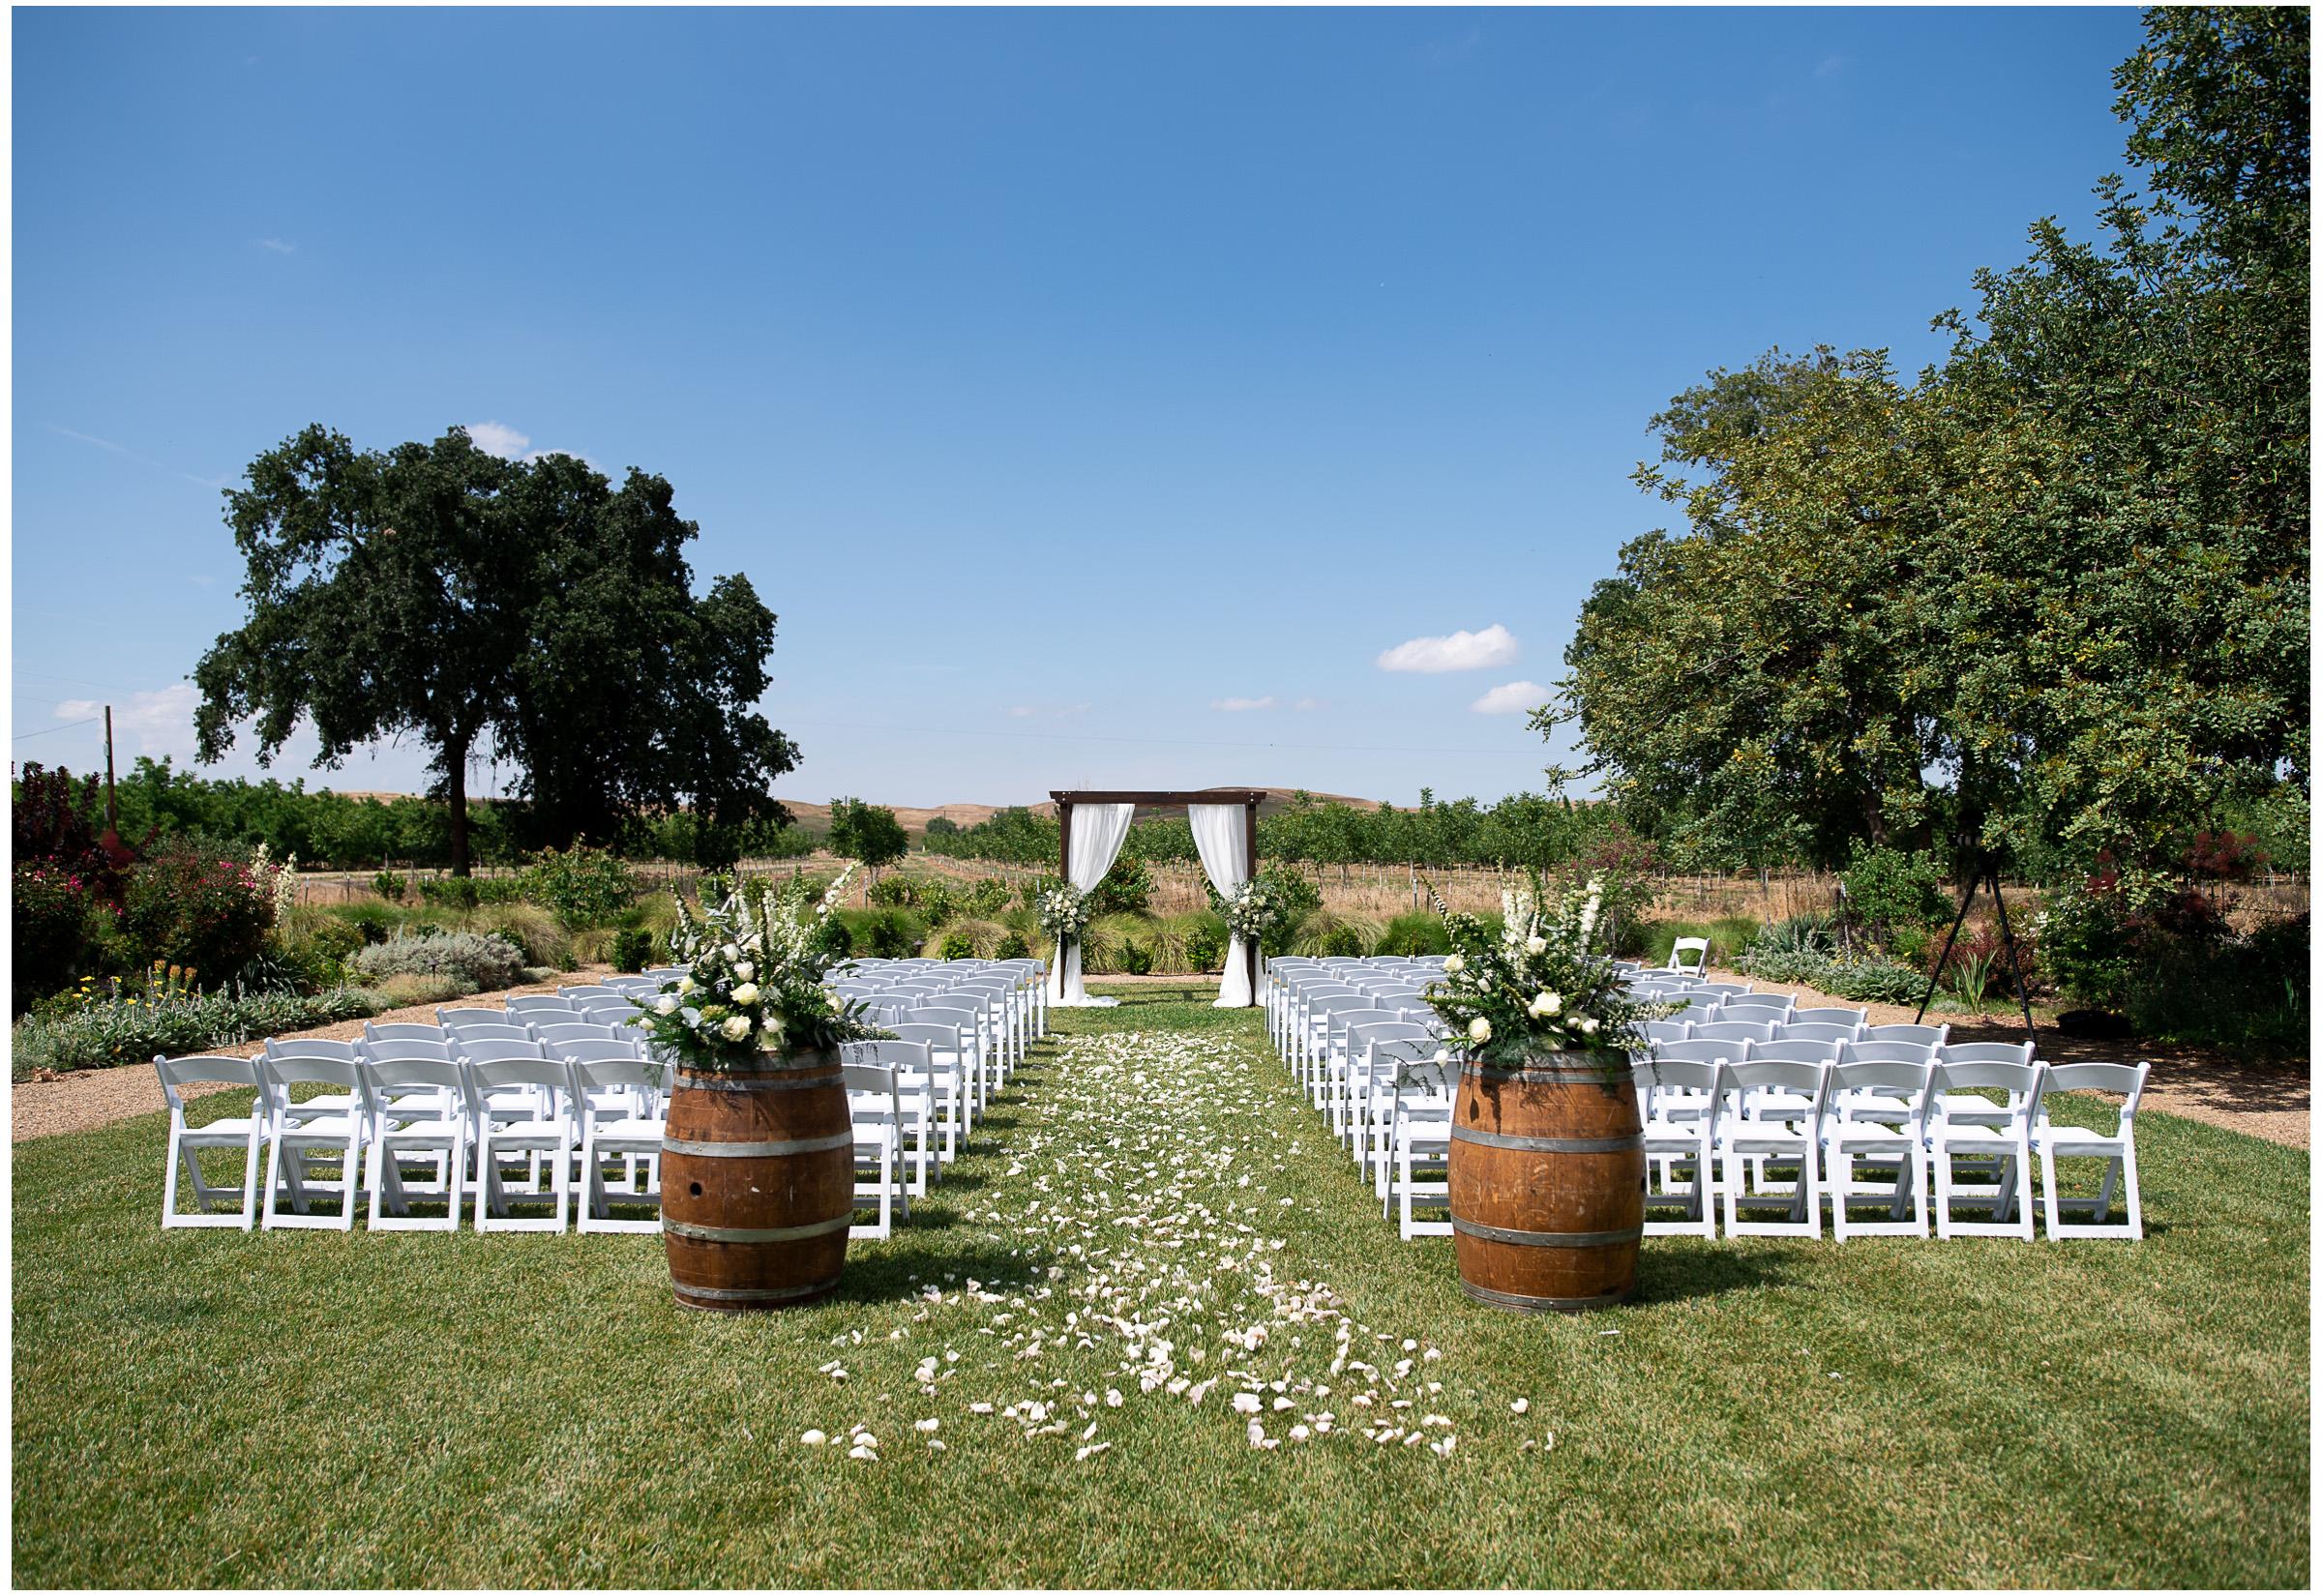 Winters Wedding - Sacramento Photographer - Field & Pond - Justin Wilcox Photography - 17.jpg